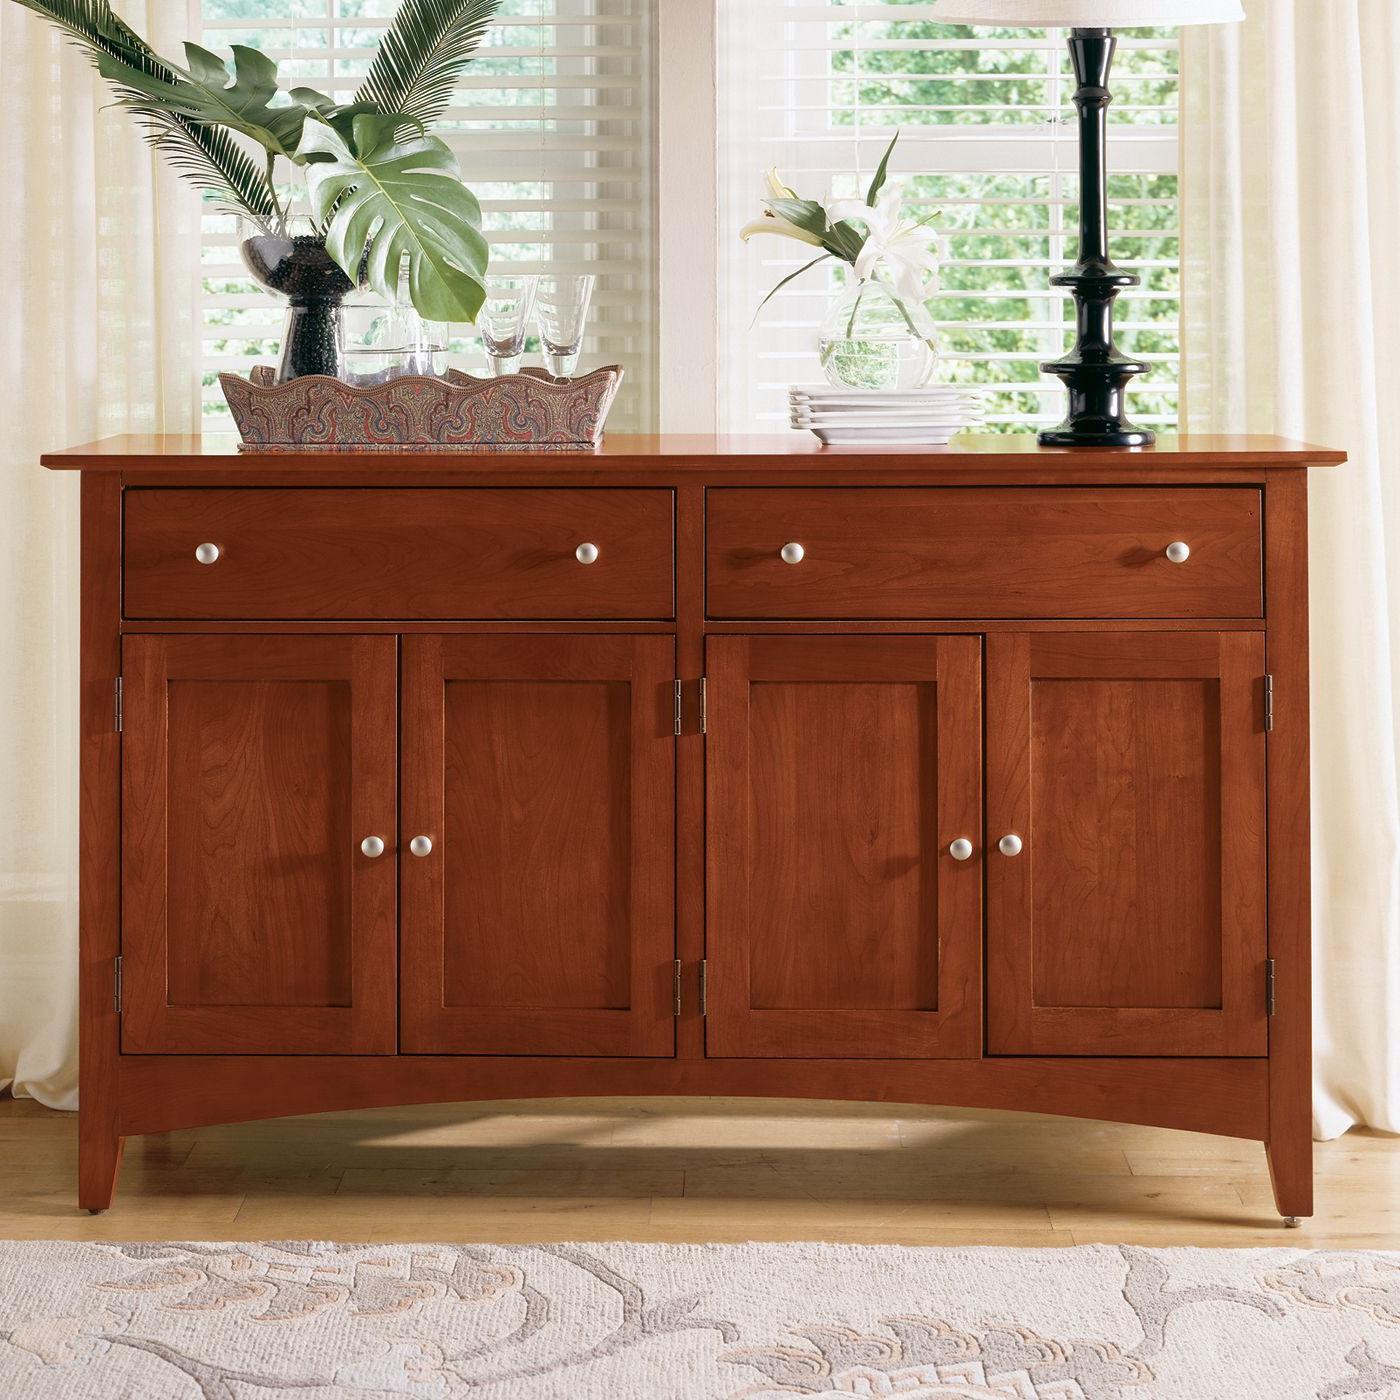 Popular Kincaid Furniture 43 090 Gathering House Sideboard, Satin With Nashoba Sideboards (View 17 of 20)